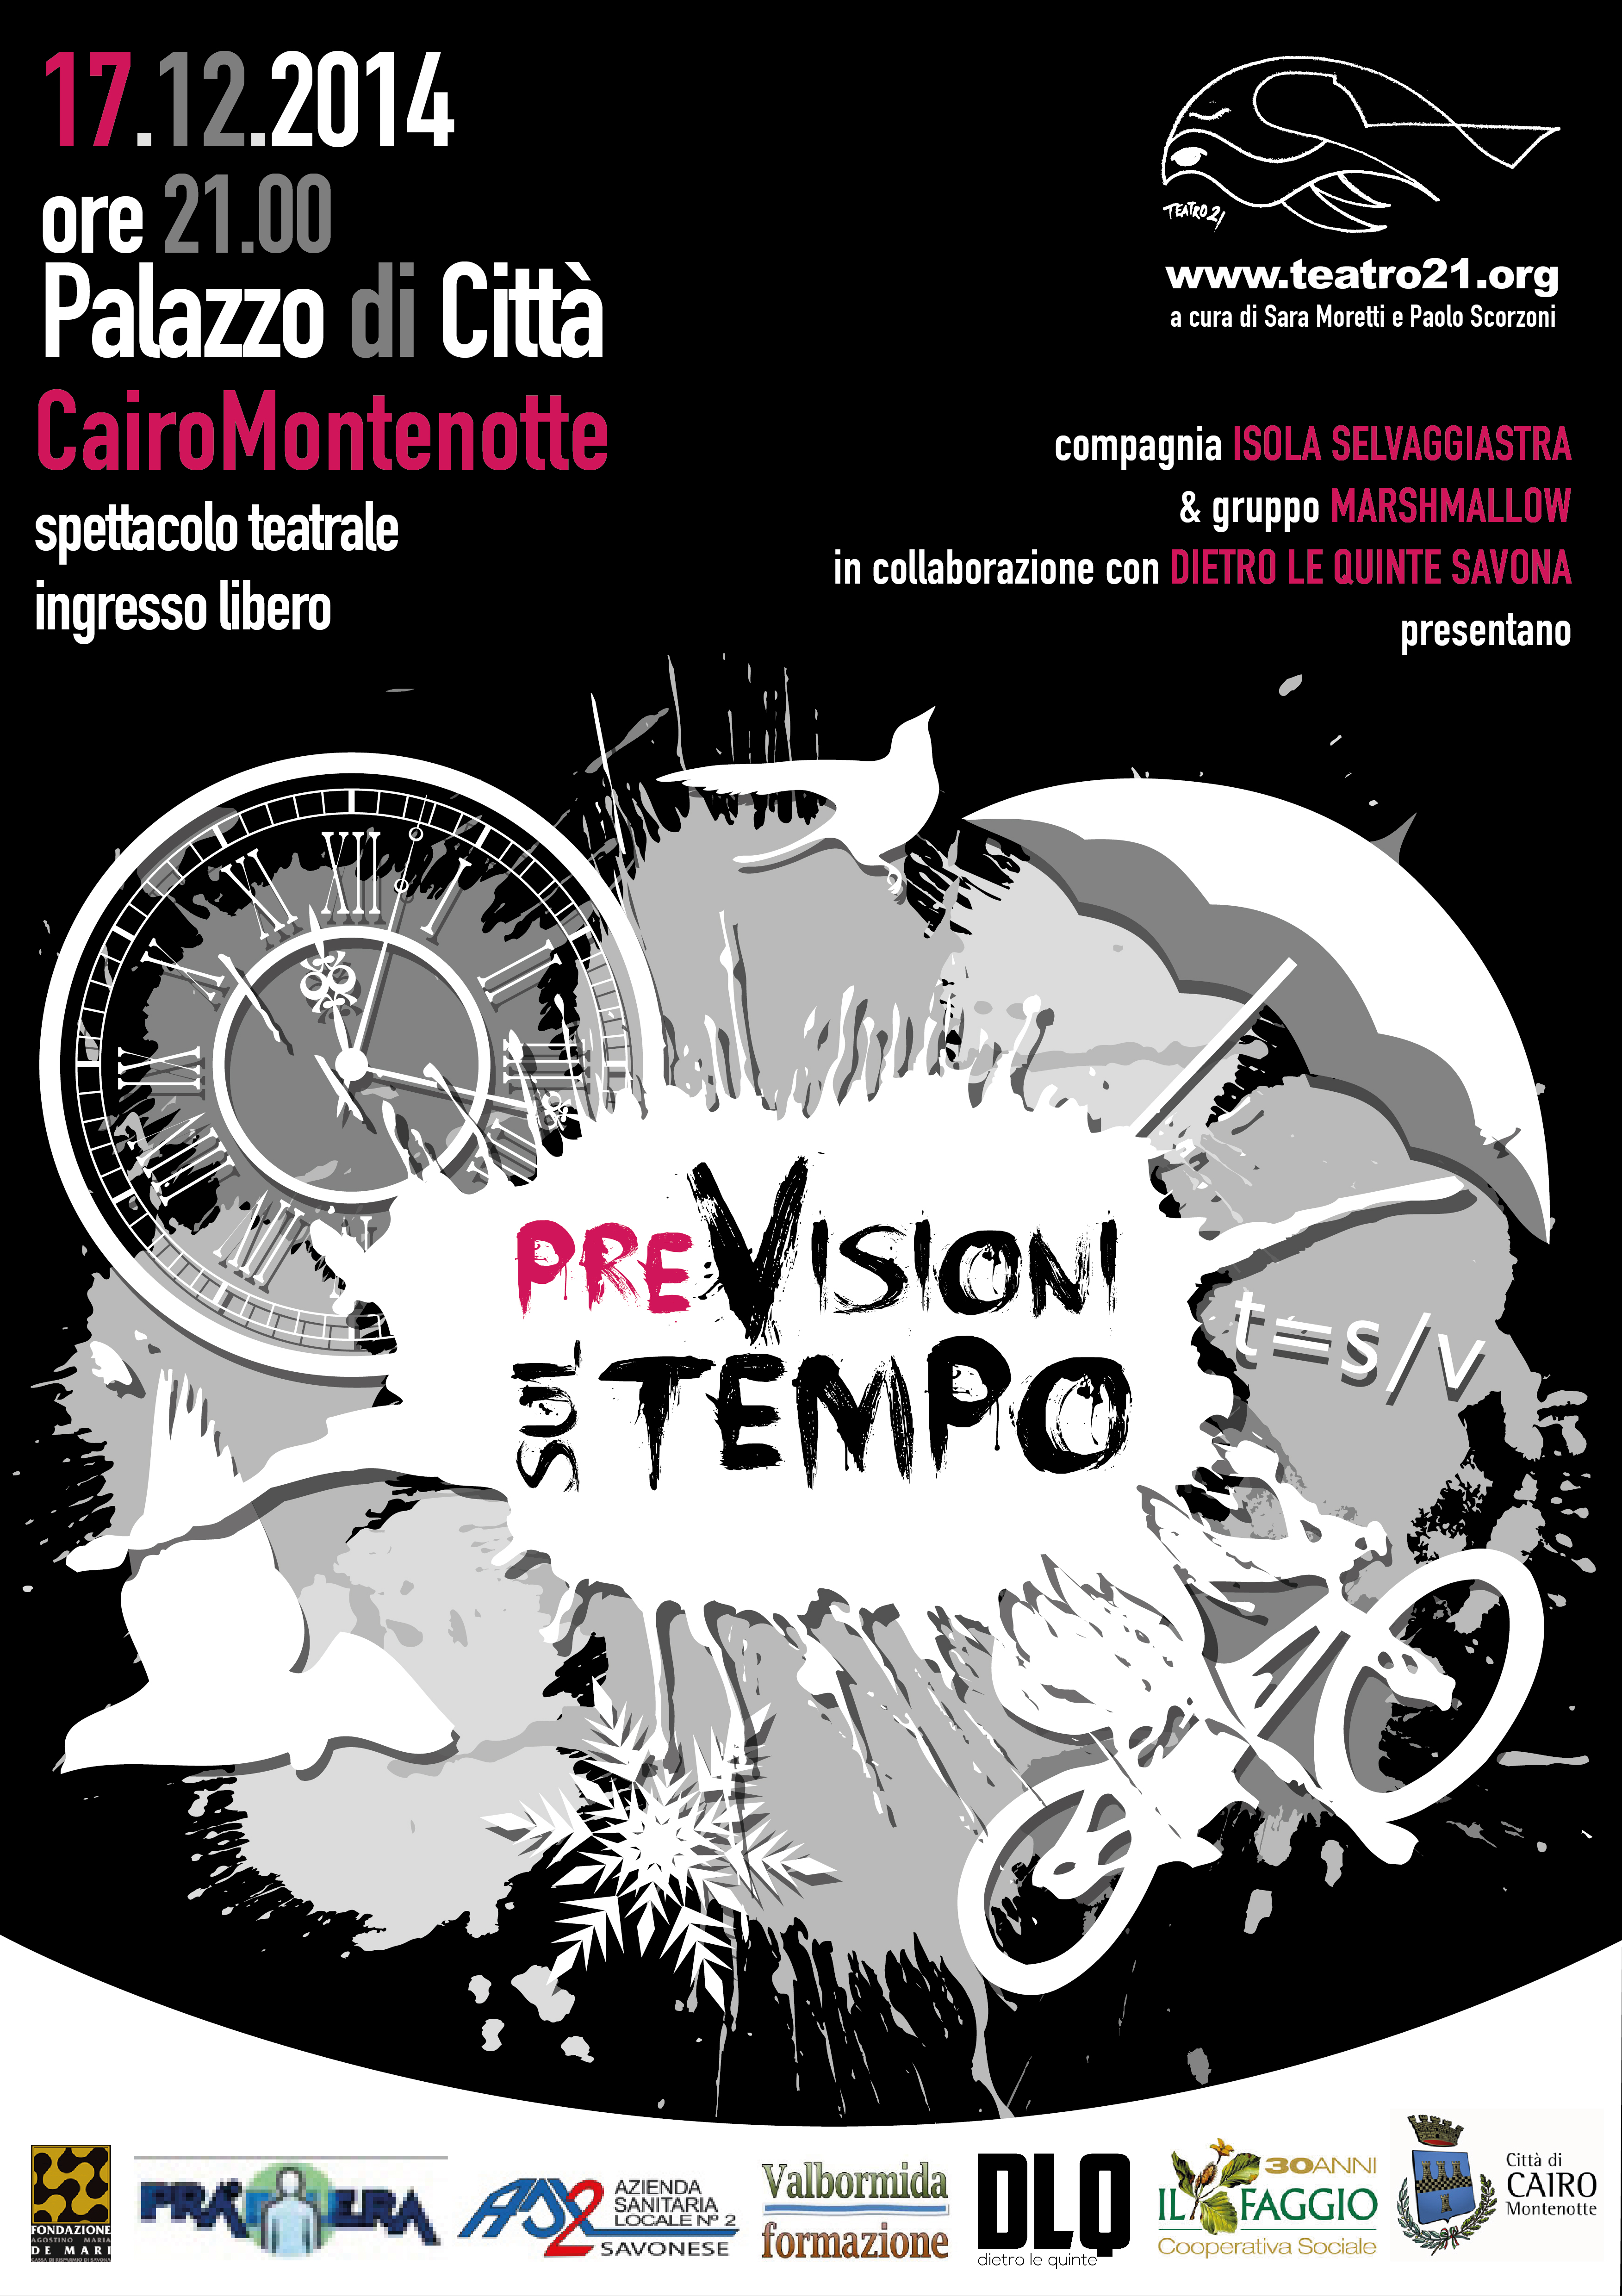 Locandina Teatro 21 Definitivo.jpg